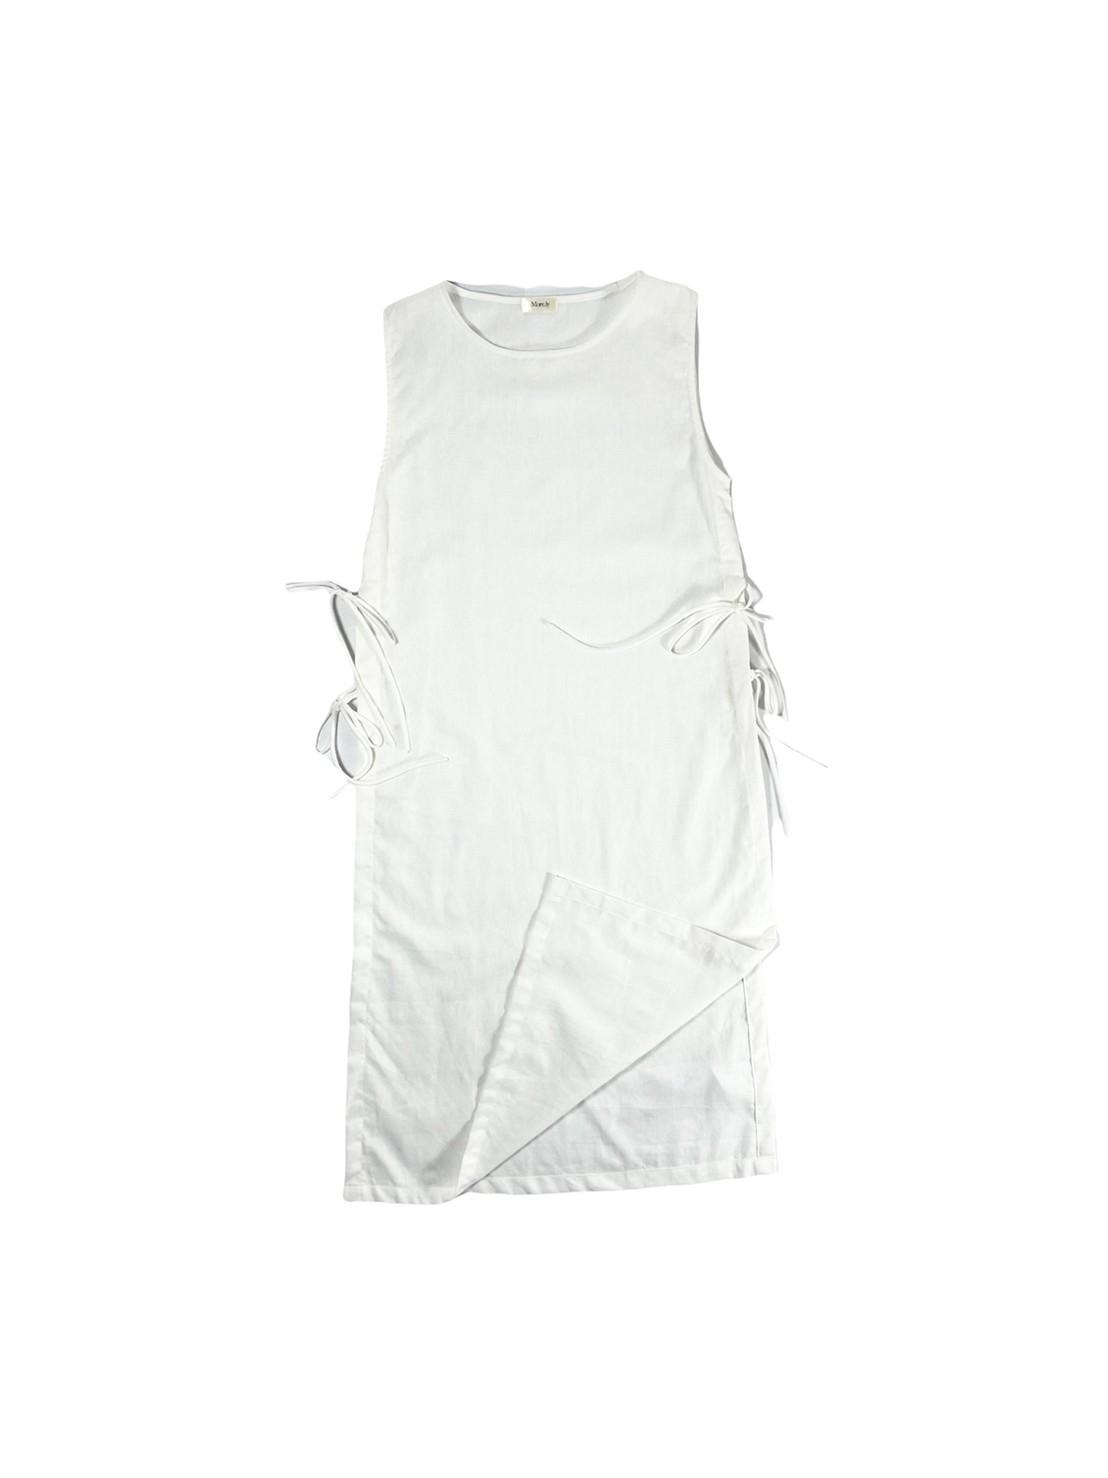 Daisy Dress (White)